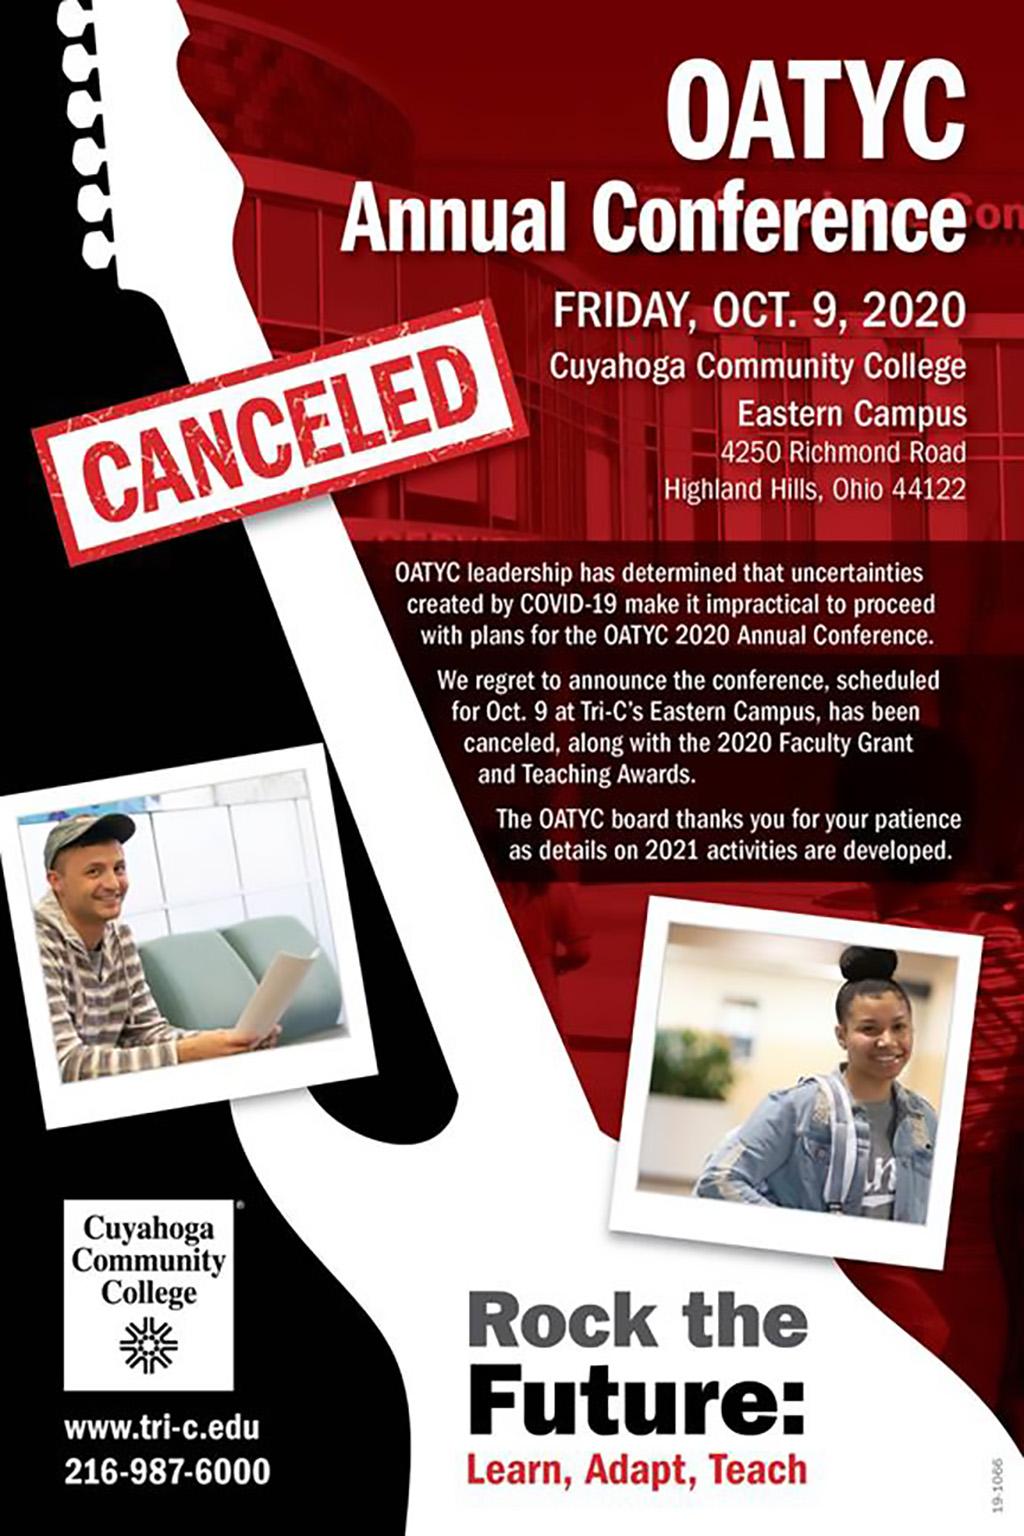 OATYC 2020 - Canceled